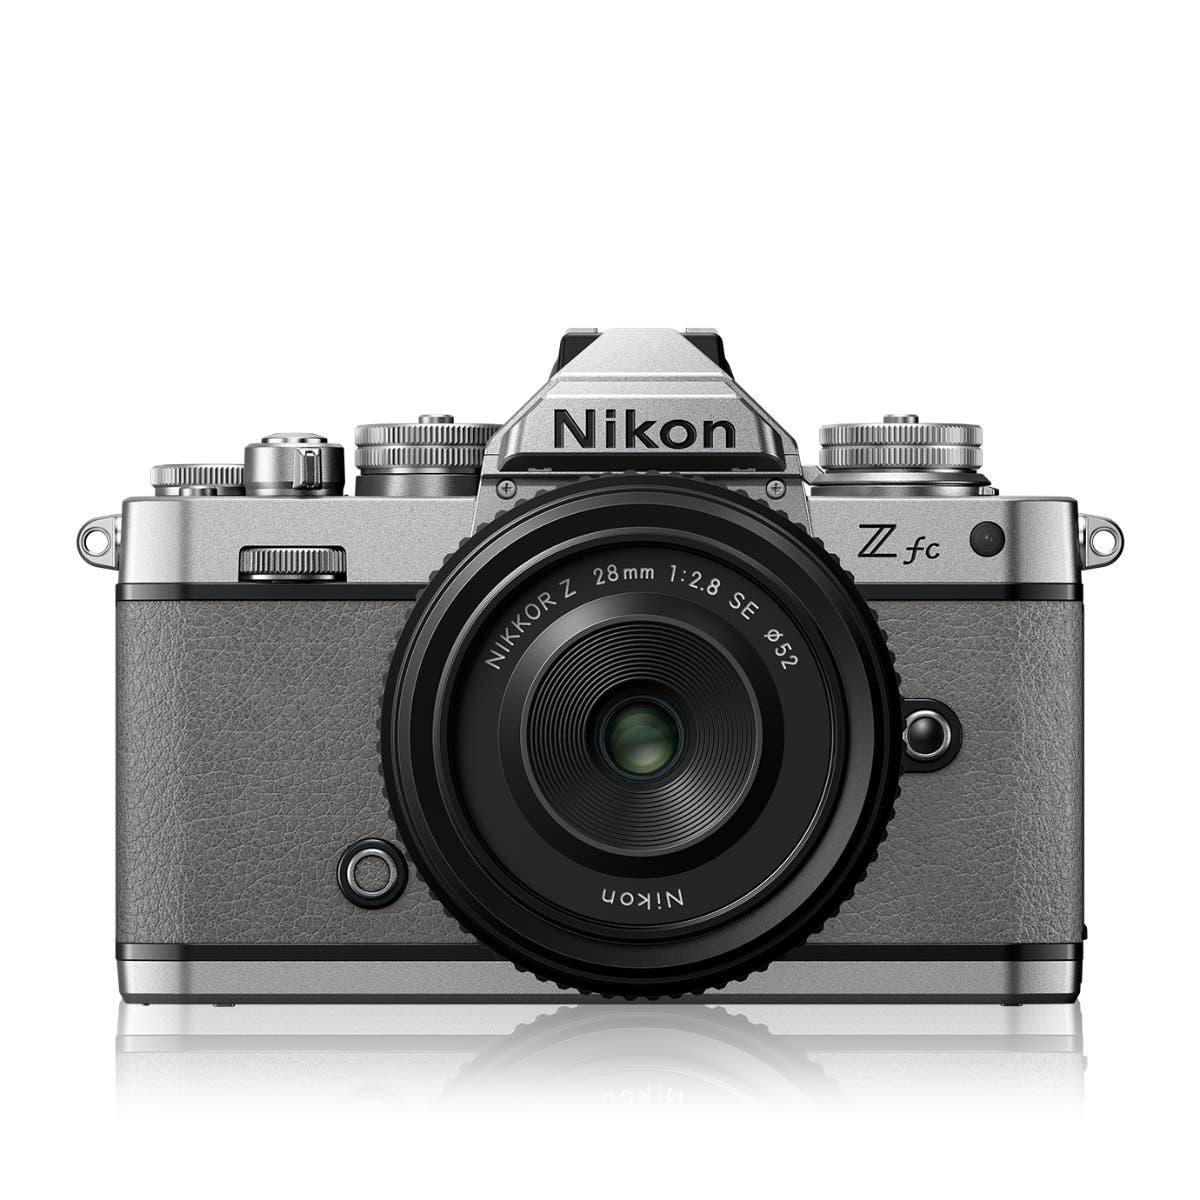 Z fc Natural Grey + NIKKOR Z 28 f/2.8 (SE)